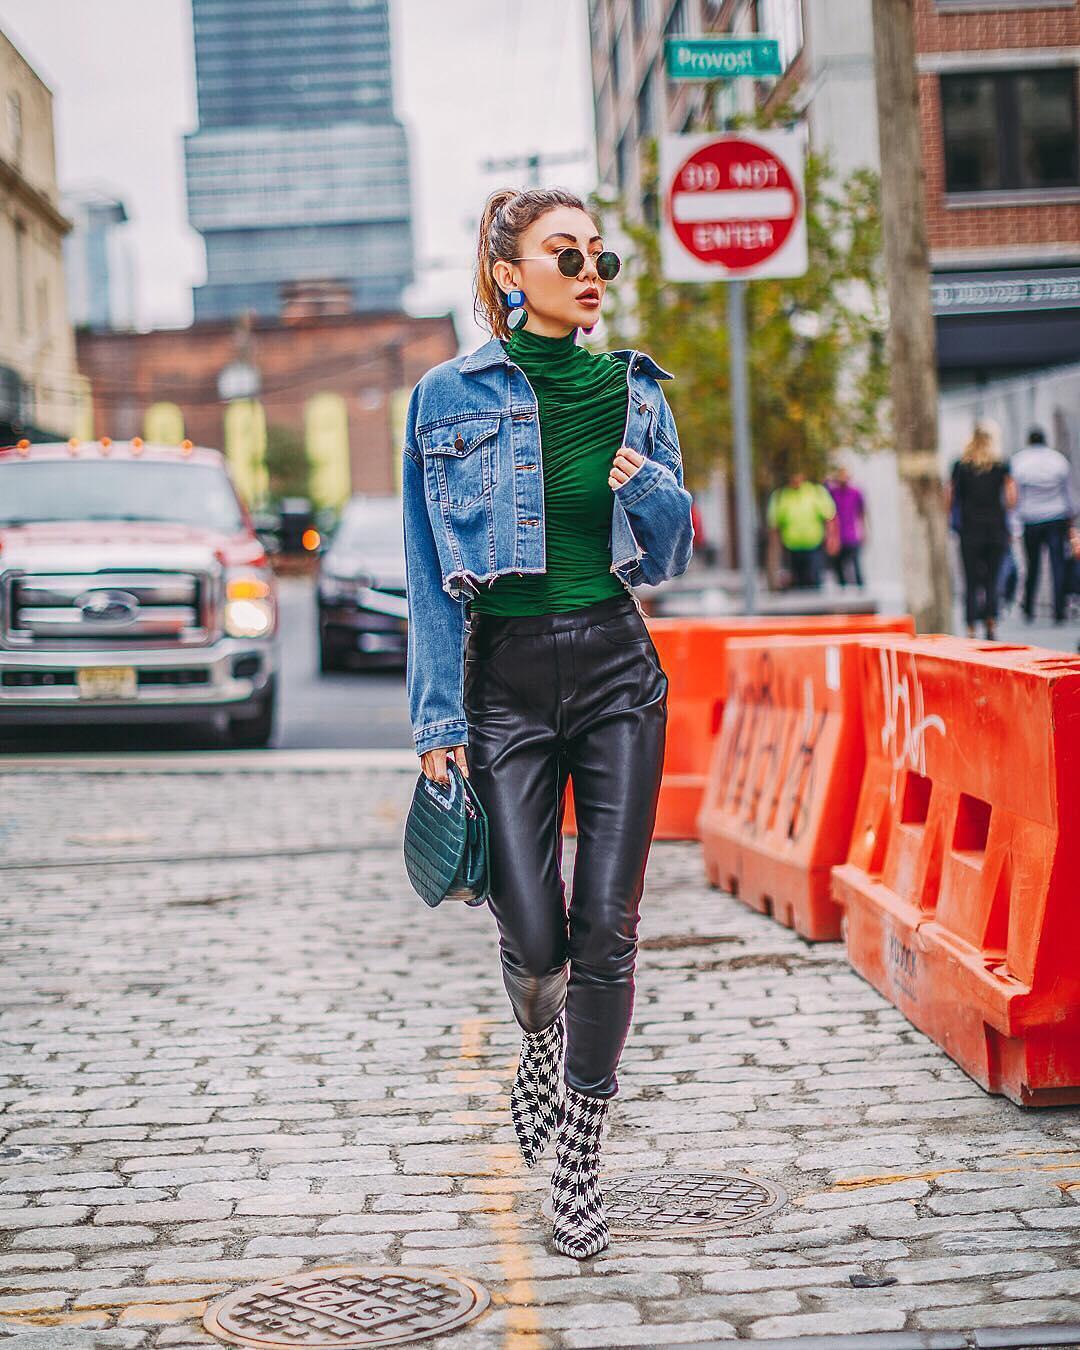 Denim jacket and black leather pants for Urban Street Walks 2021